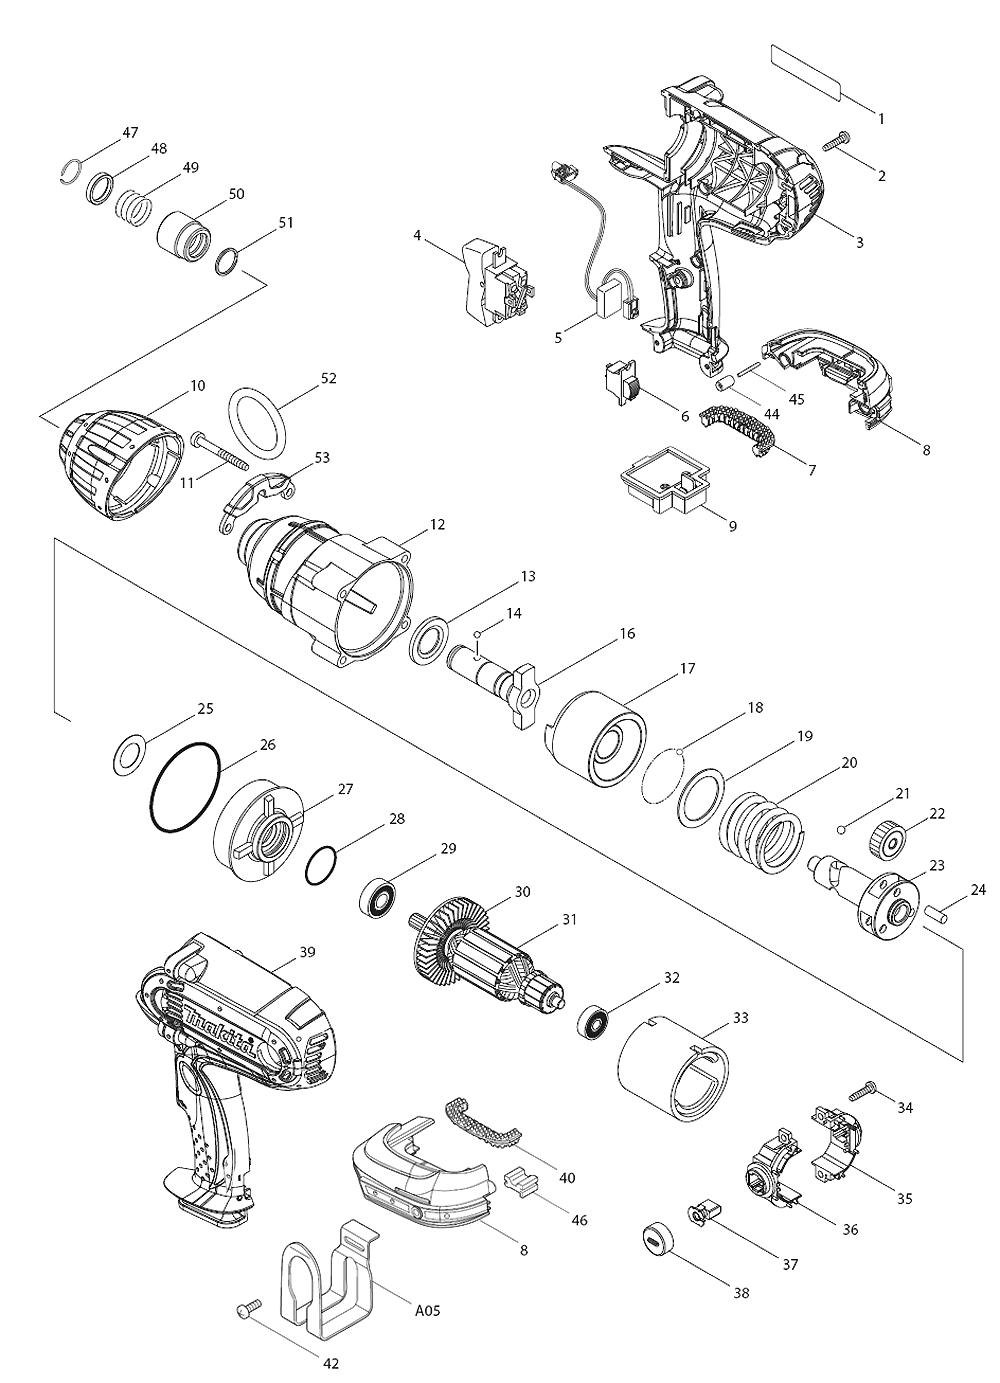 Parts | Makita LXWT01 Cordless Impact Wrench & Driver Parts Diagram